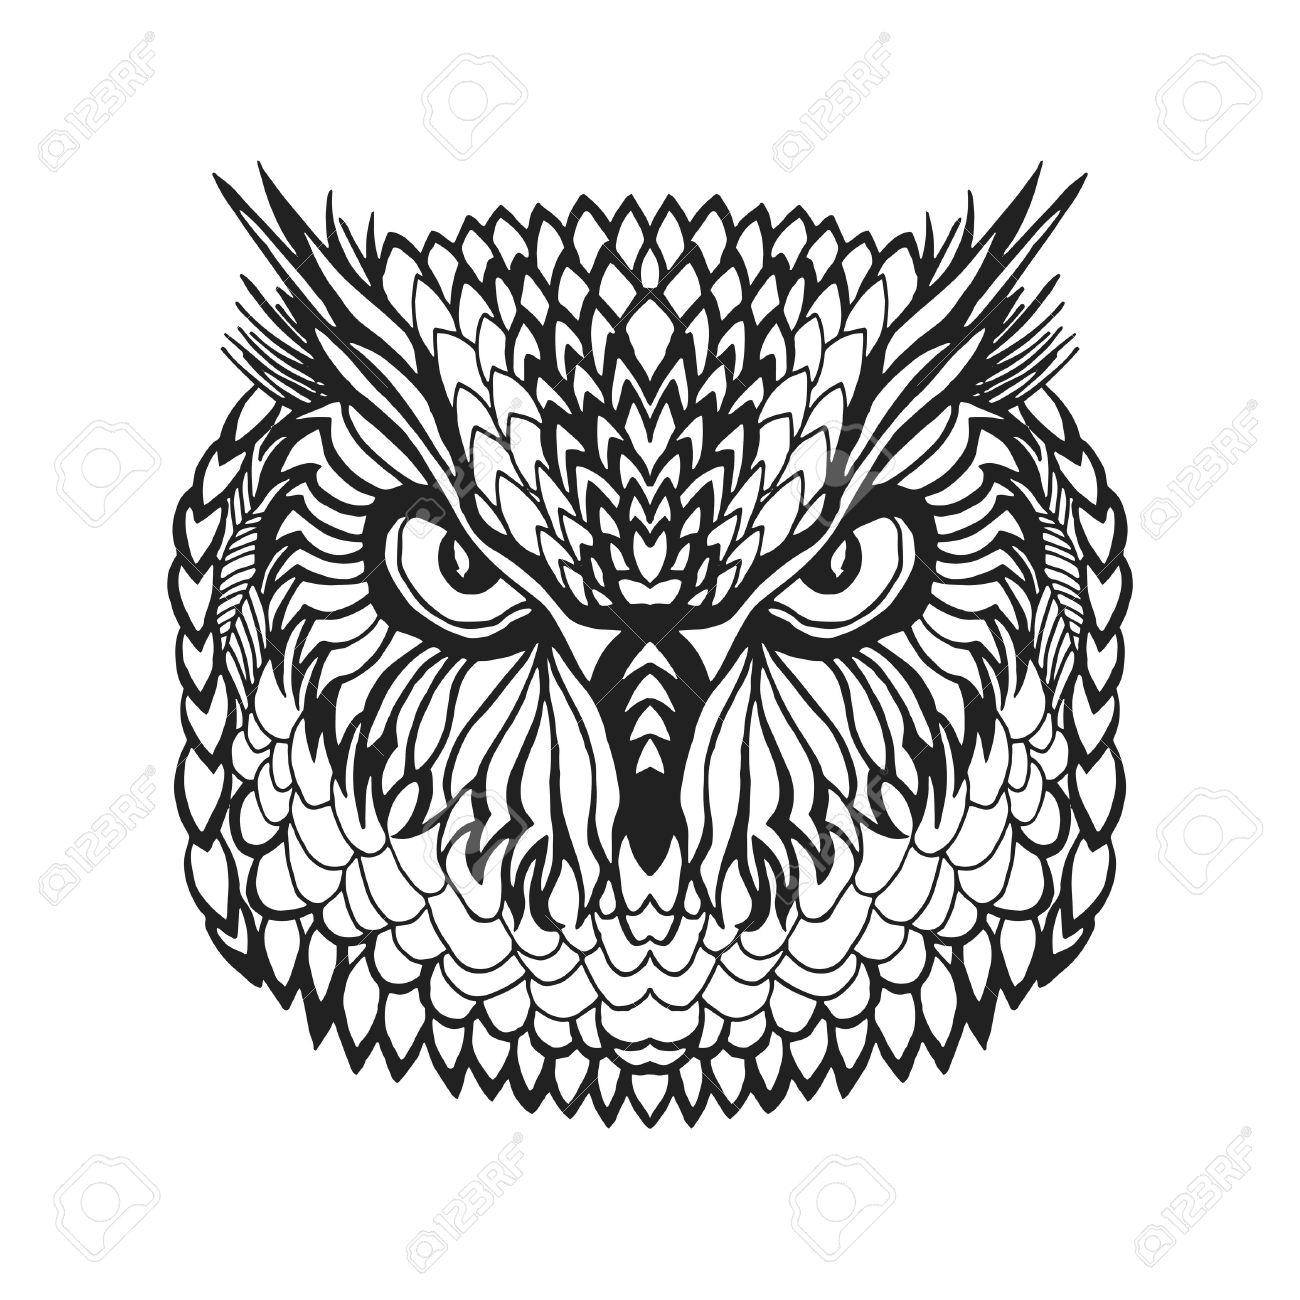 1300x1300 Zentangle Stylized Eagle Owl Head. Animals. Black White Hand Drawn